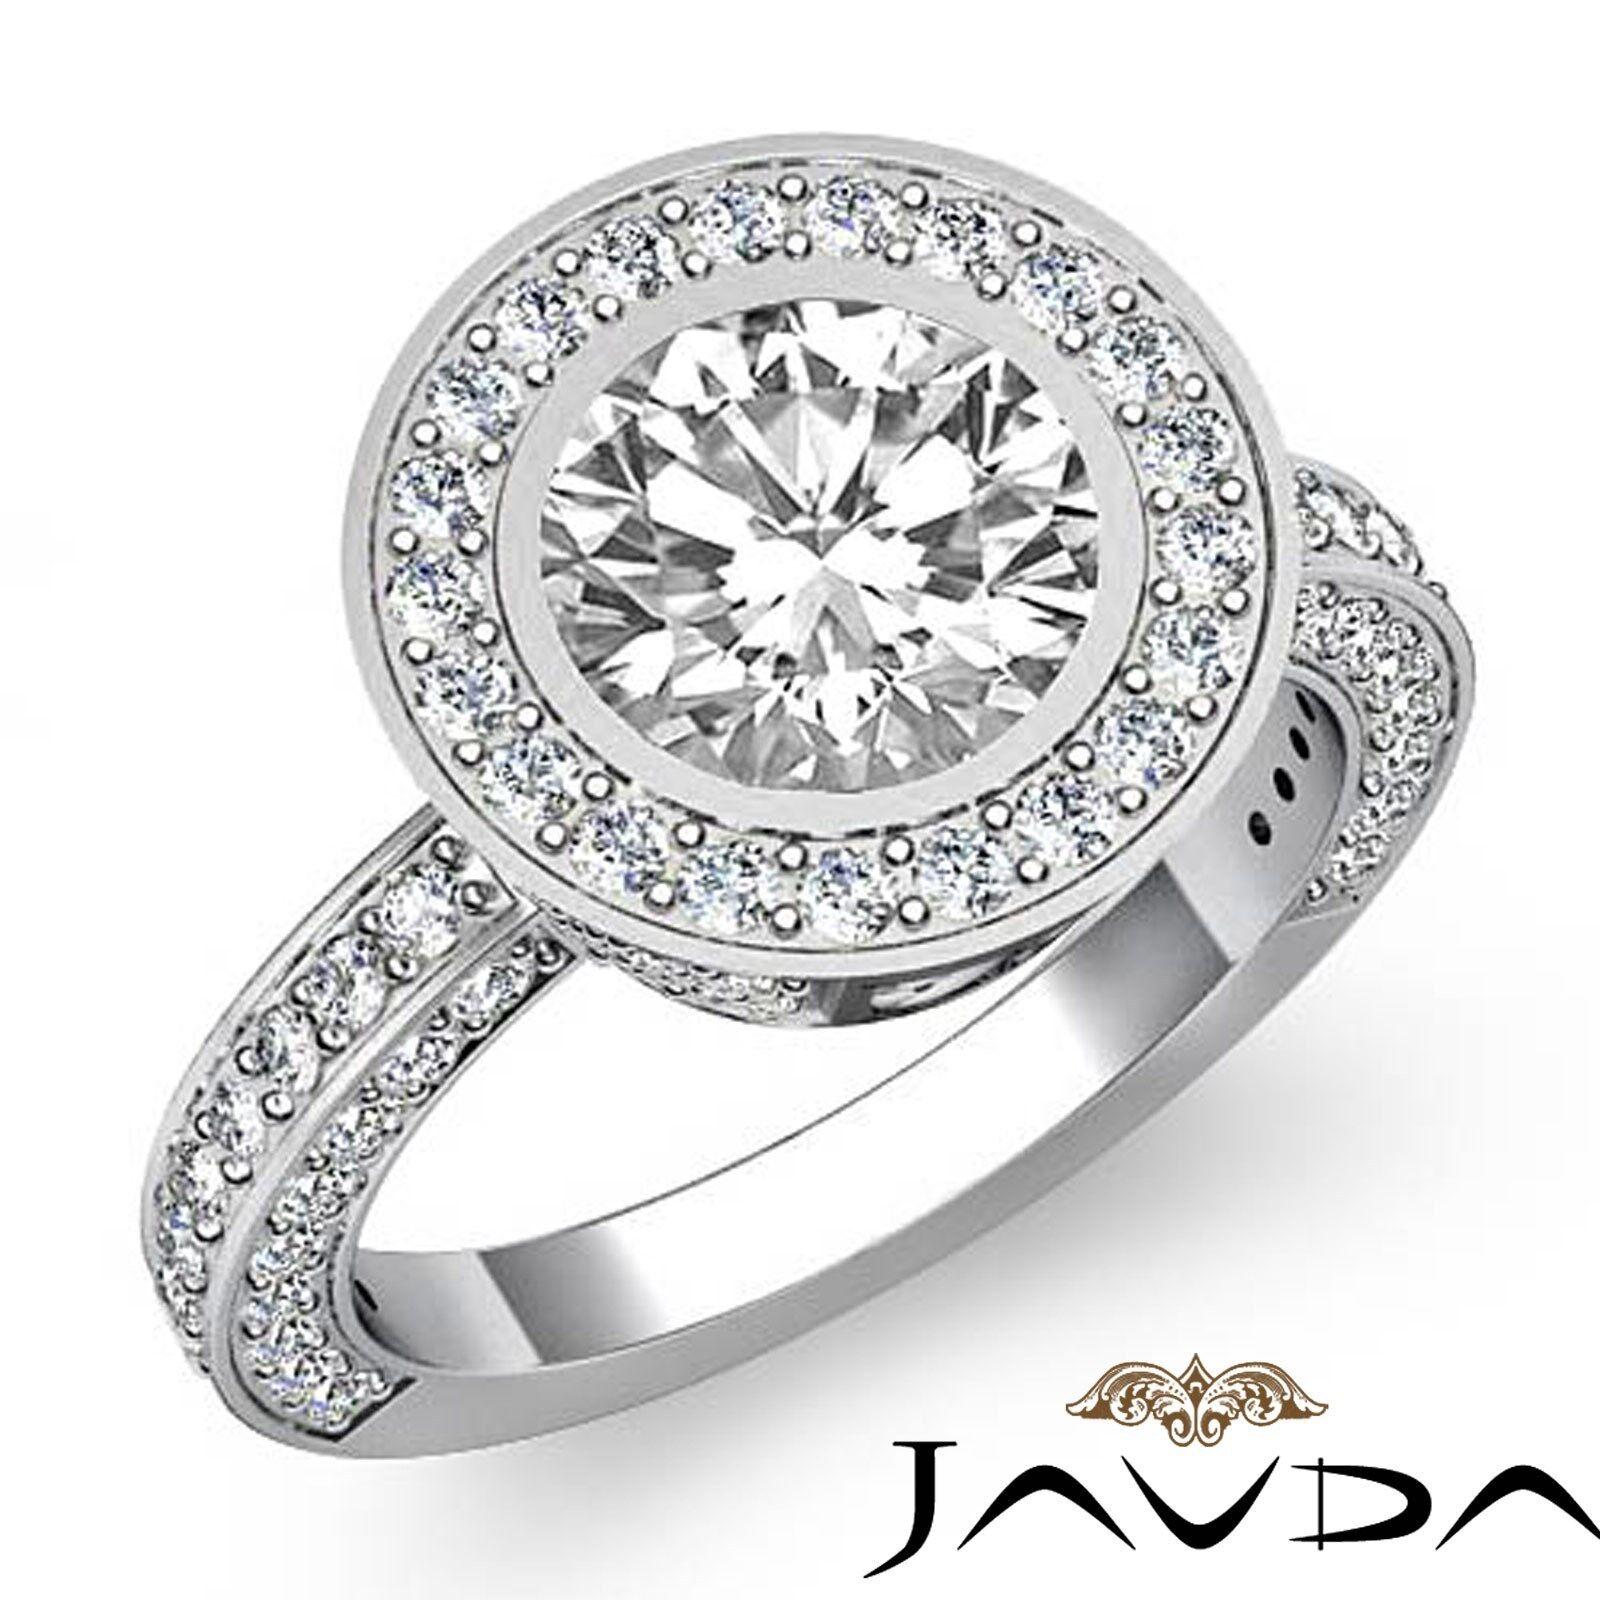 Bezel Halo Pave Setting Round Diamond Engagement White Gold Ring GIA F VS2 3 Ct